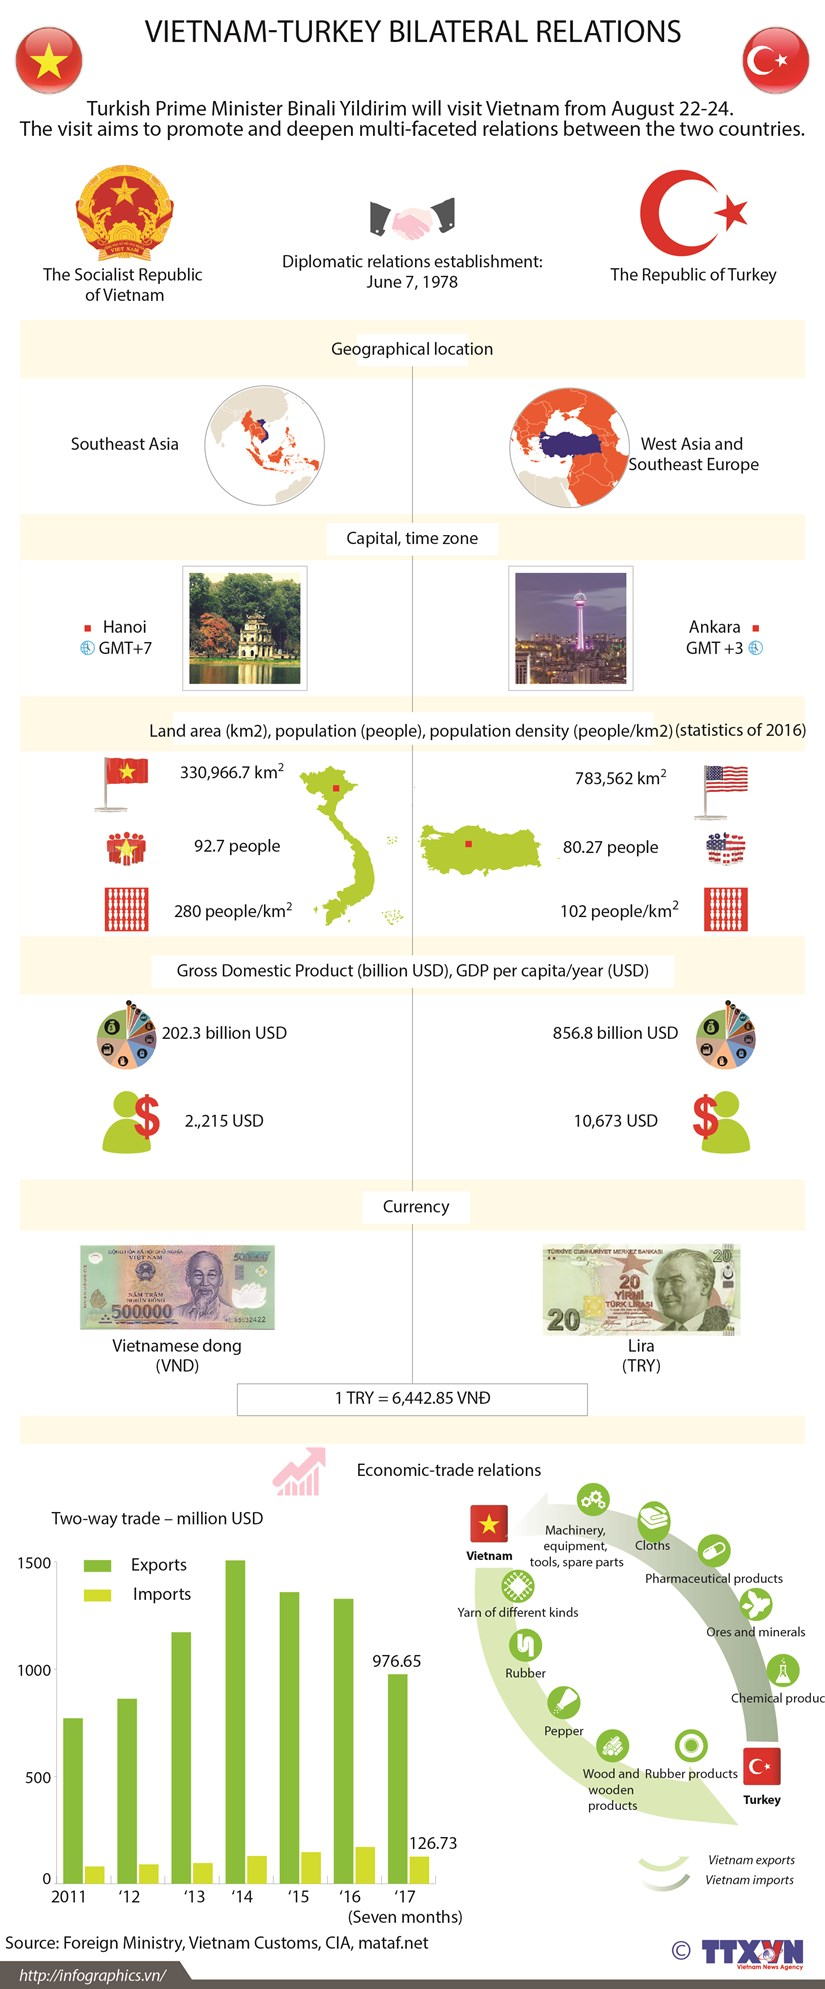 Vietnam-Turkey bilateral relations hinh anh 1